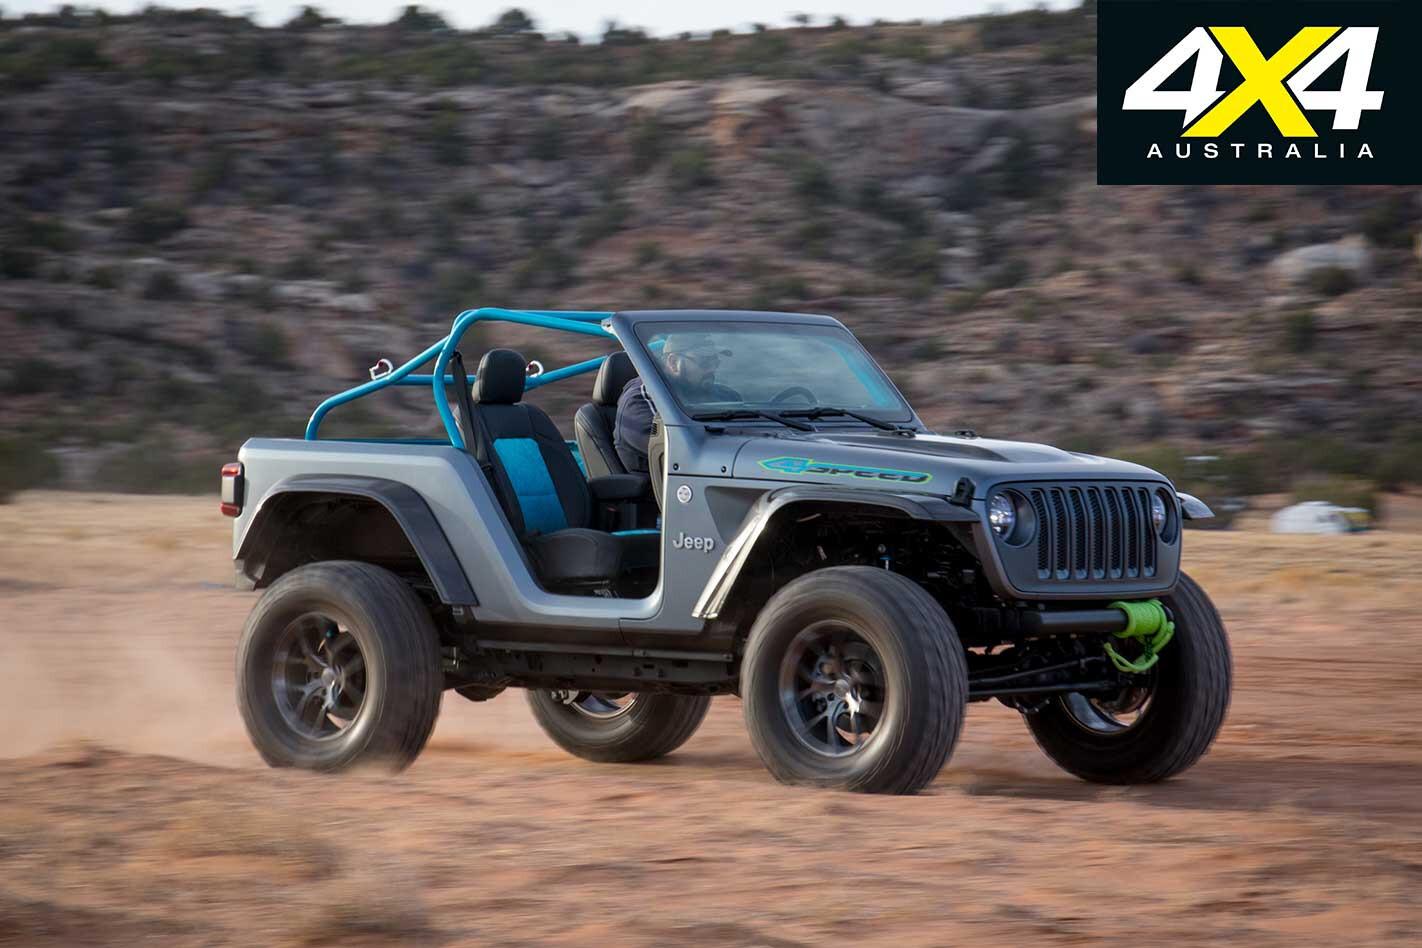 2018 Moab Easter Jeep Safari Concept 4 X 4 Highlights 4 Speed Jpg